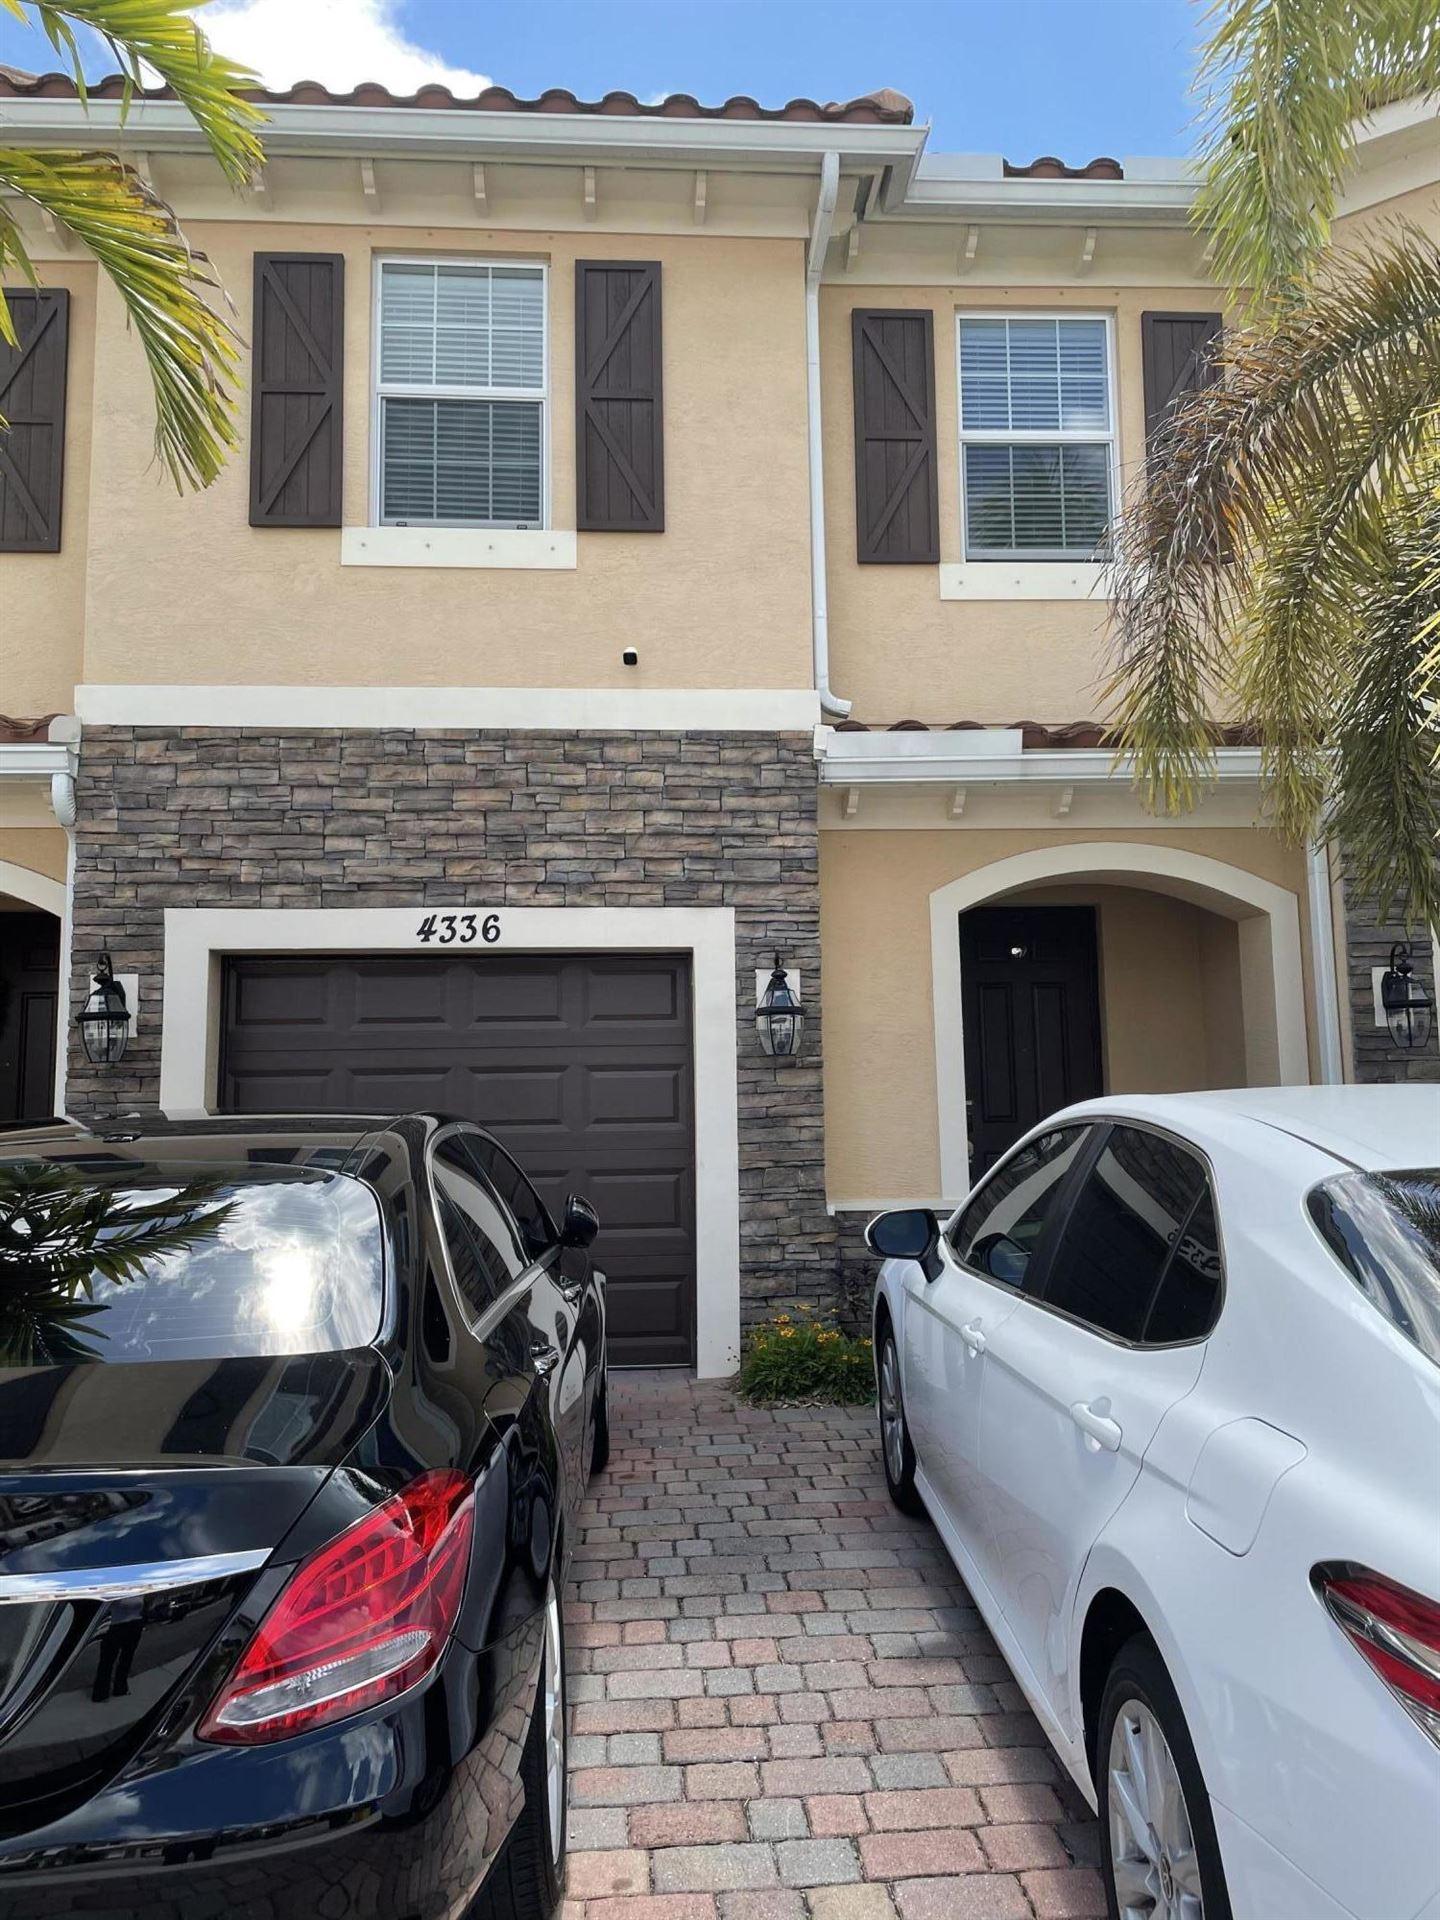 4336 Brewster Lane, West Palm Beach, FL 33417 - MLS#: RX-10720727